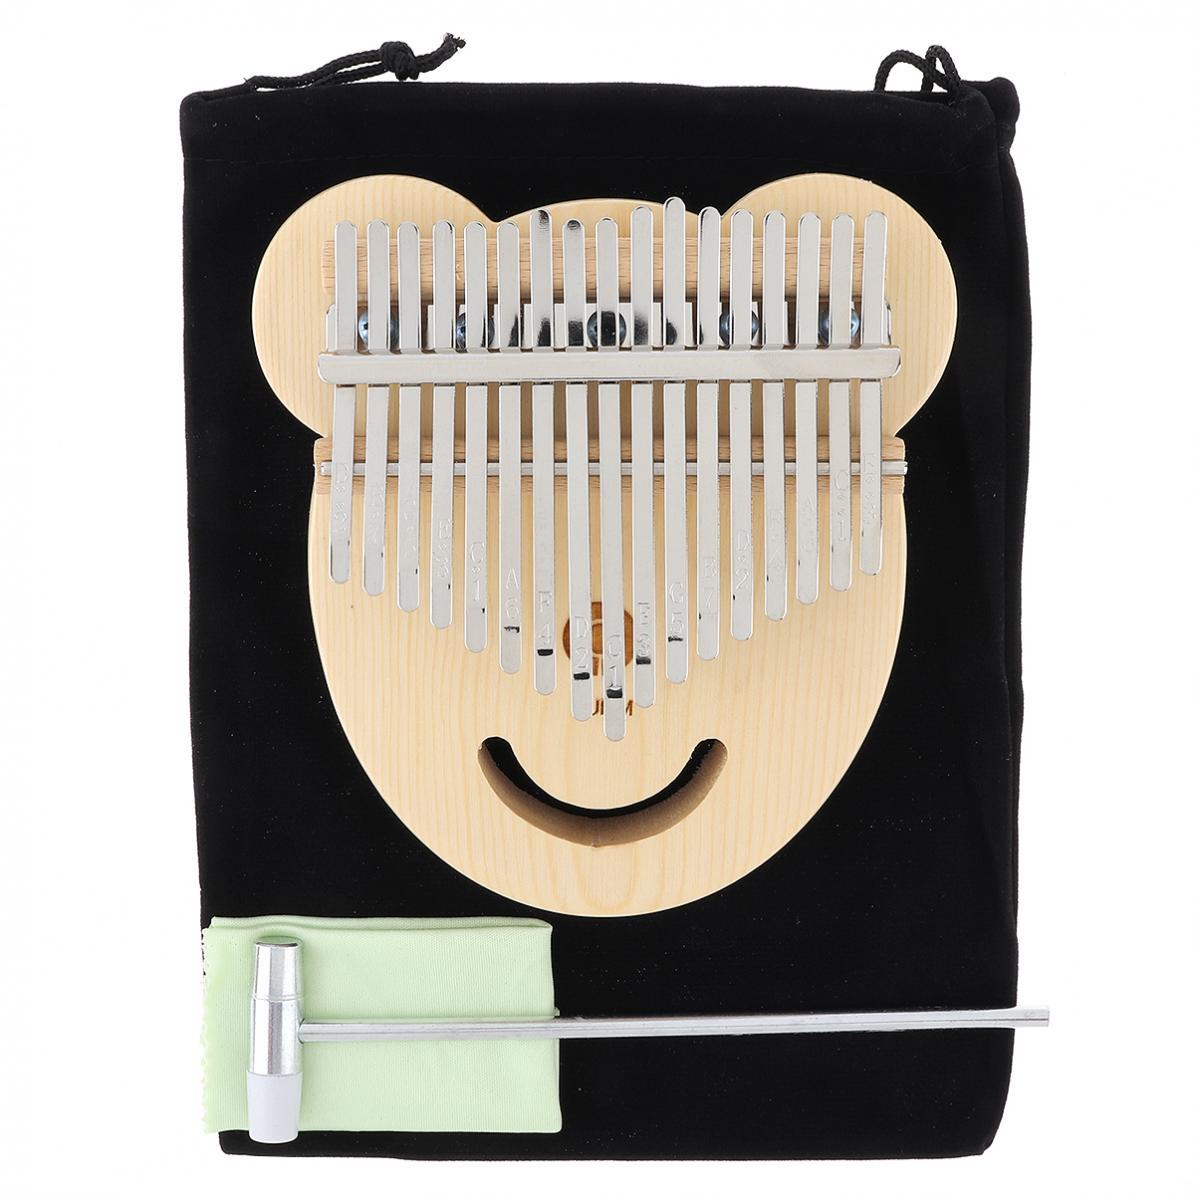 17 Key Thumb Piano  Spruce Bear Face Shape Thumb Piano Kalimba Mbira with Tuning Hammer Keyboard Instruments enlarge